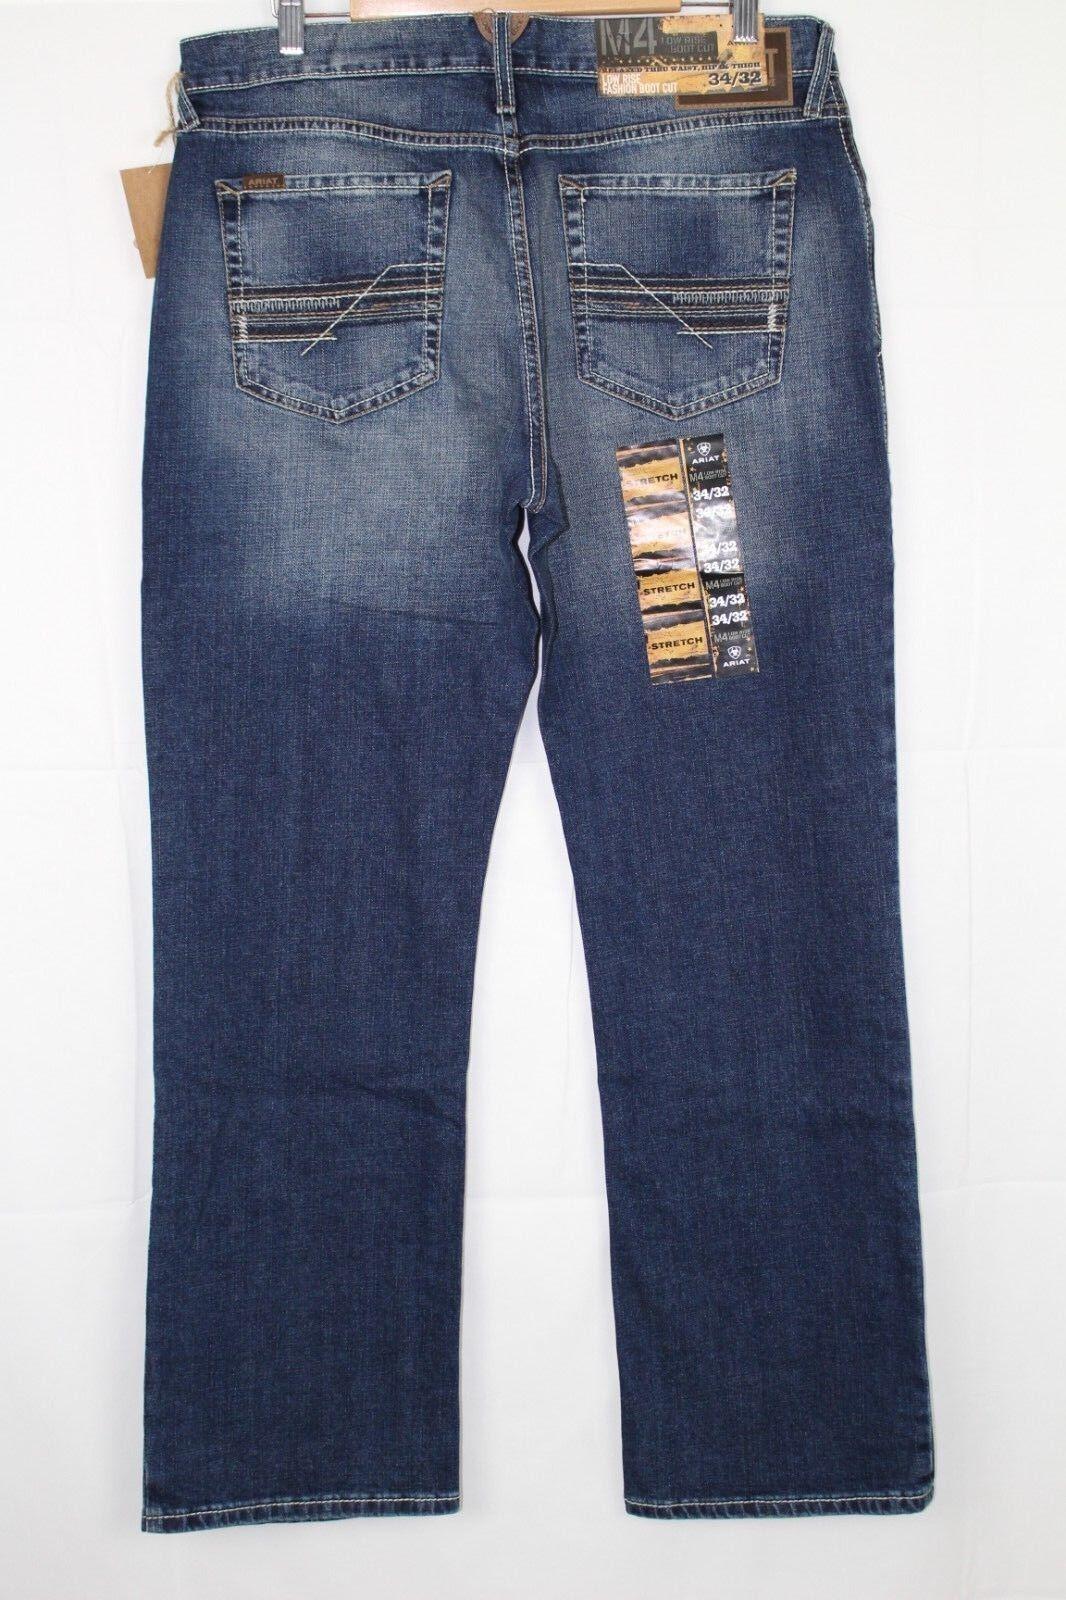 New Ariat Men's M4 Low Rise Boot Cut Jeans 34 36 40 Cinder Wash